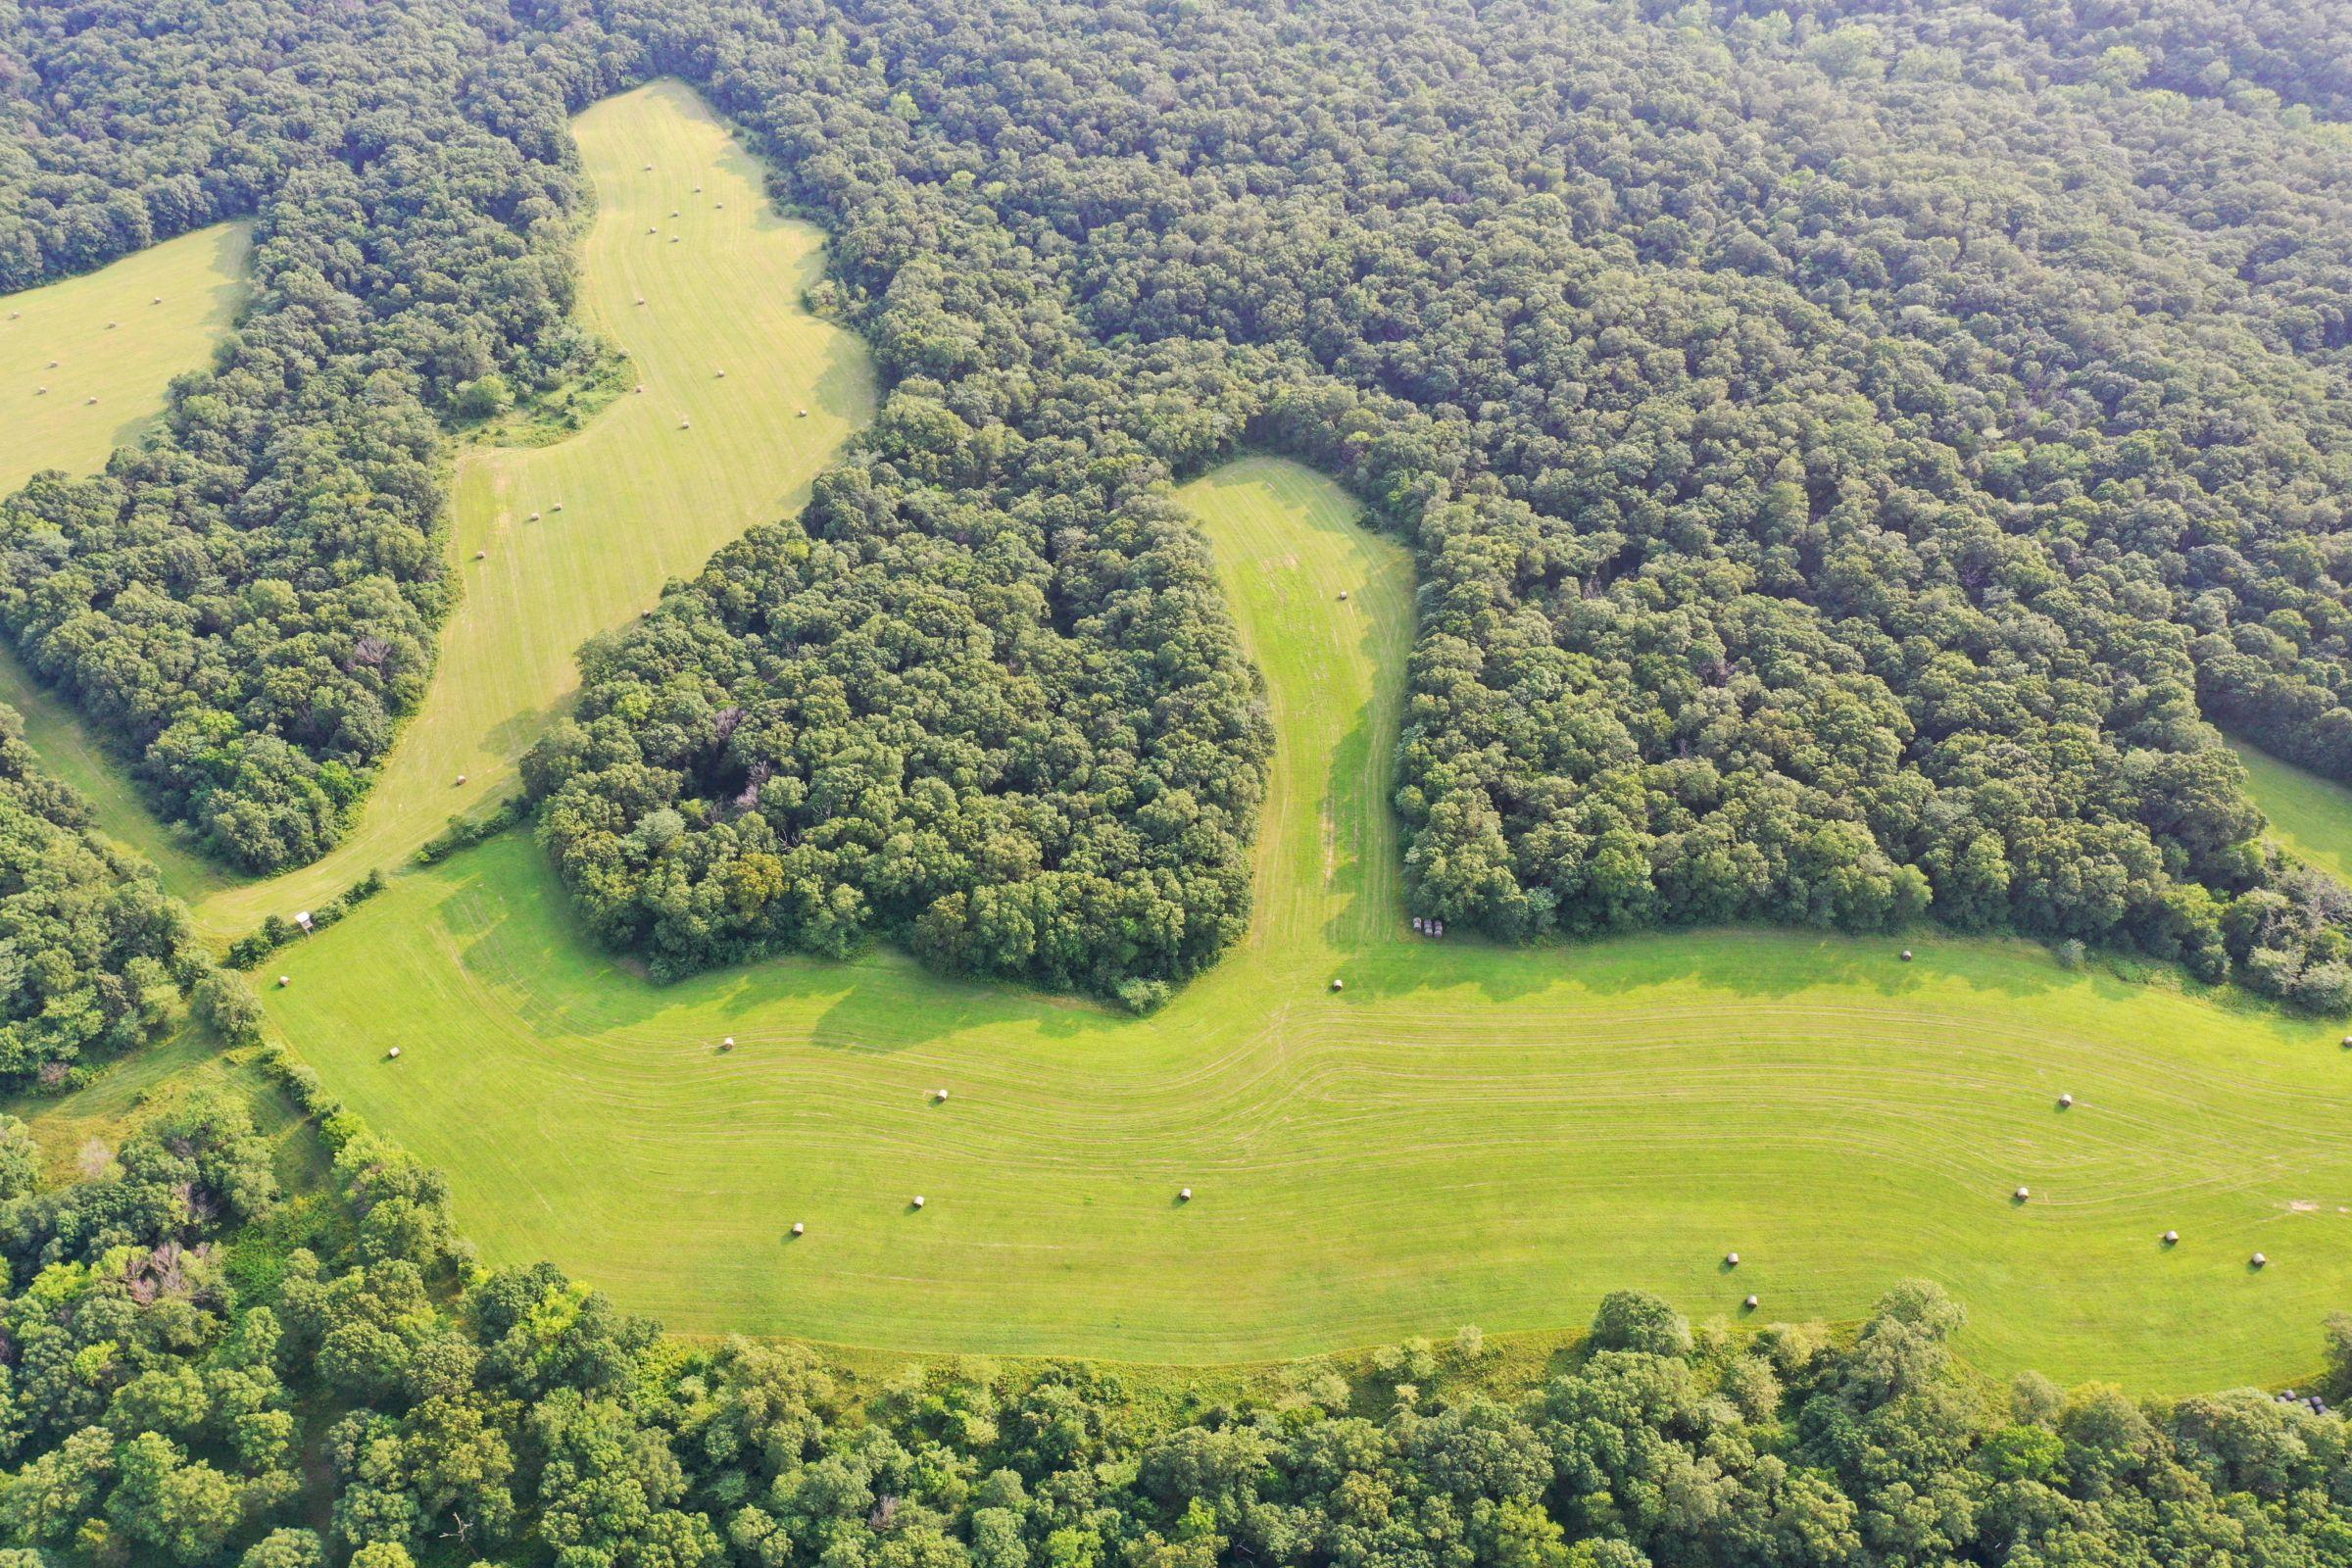 land-lee-county-iowa-340-acres-listing-number-15649-3-2021-07-21-185909.jpg